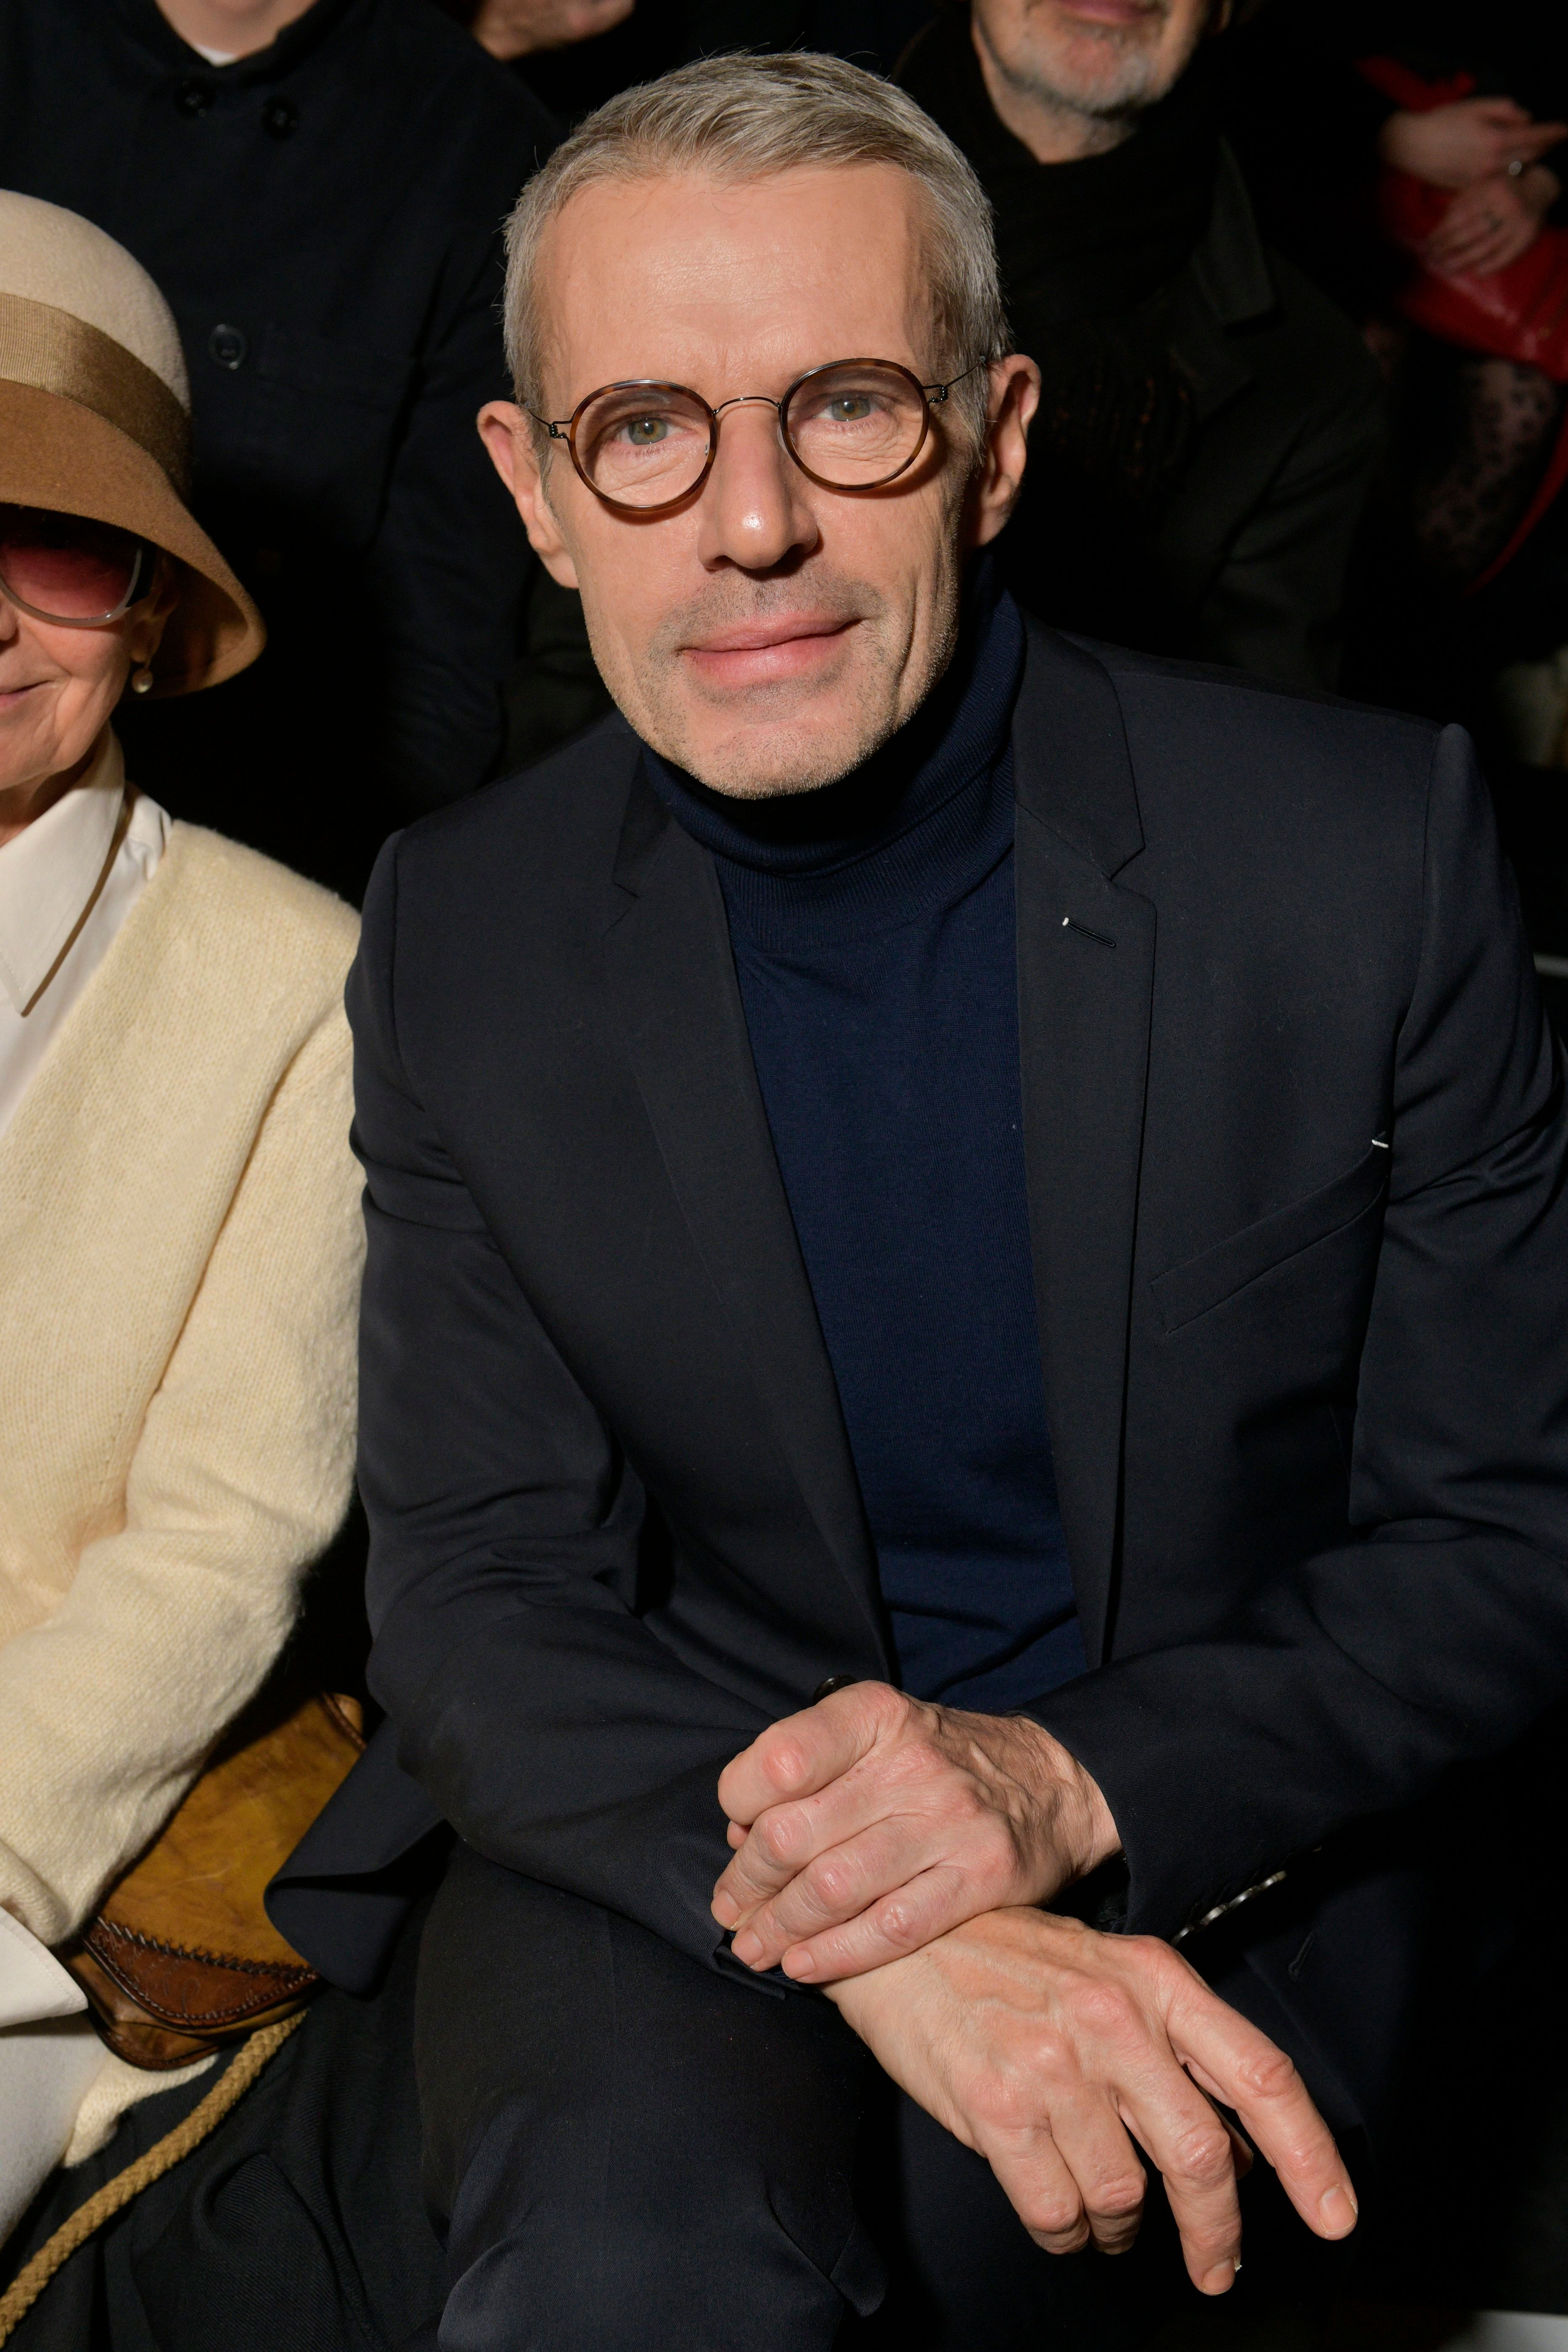 Lambert Wilson in the front rowBerluti show, Front Row, Fall Winter 2019, Paris Fashion Week Men's, France - 18 Jan 2019